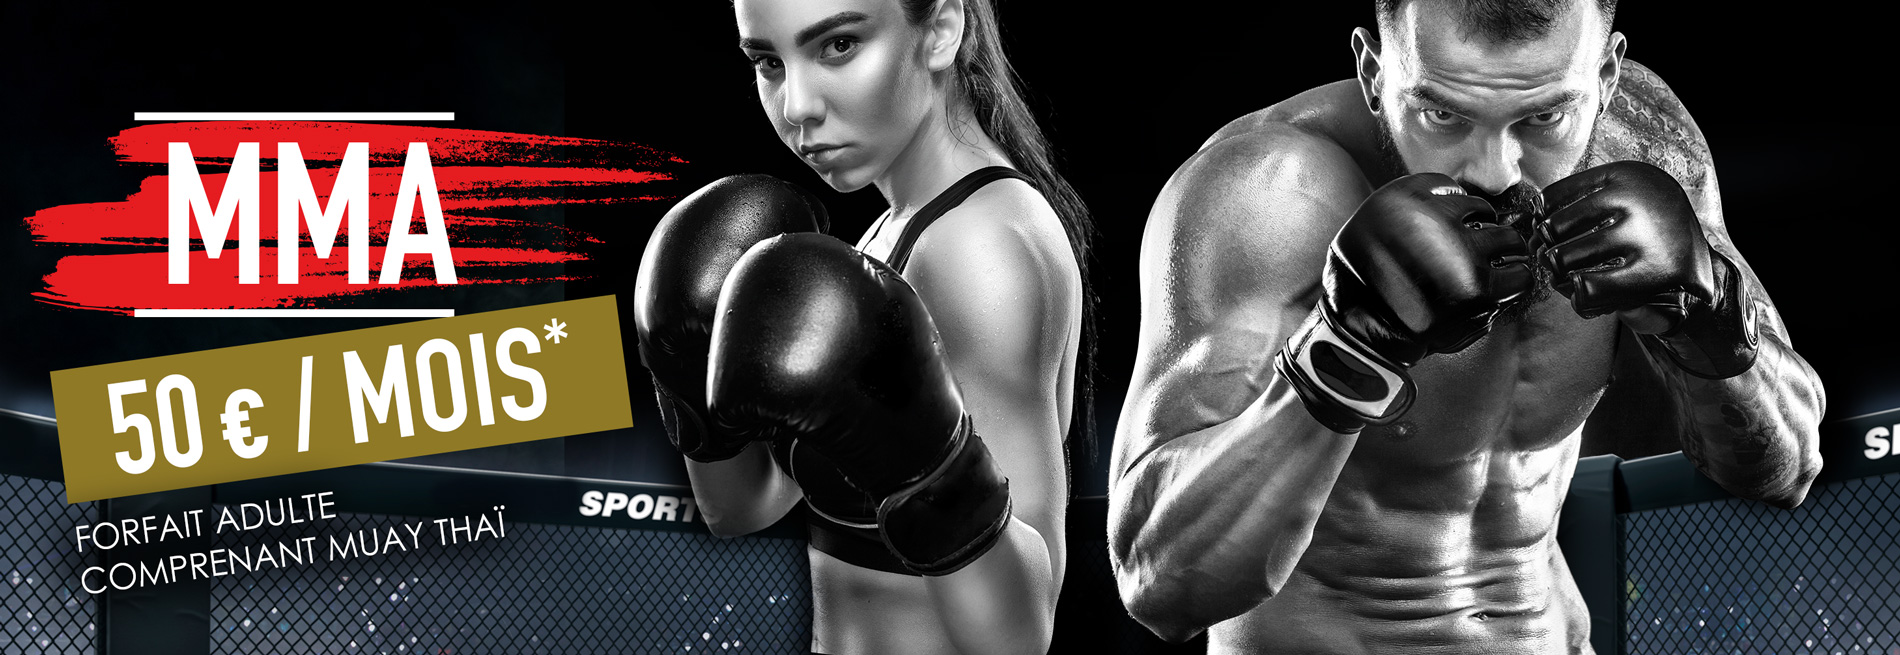 femme-homme-boxe-mma-powertrainingcenter-chalonsursaone